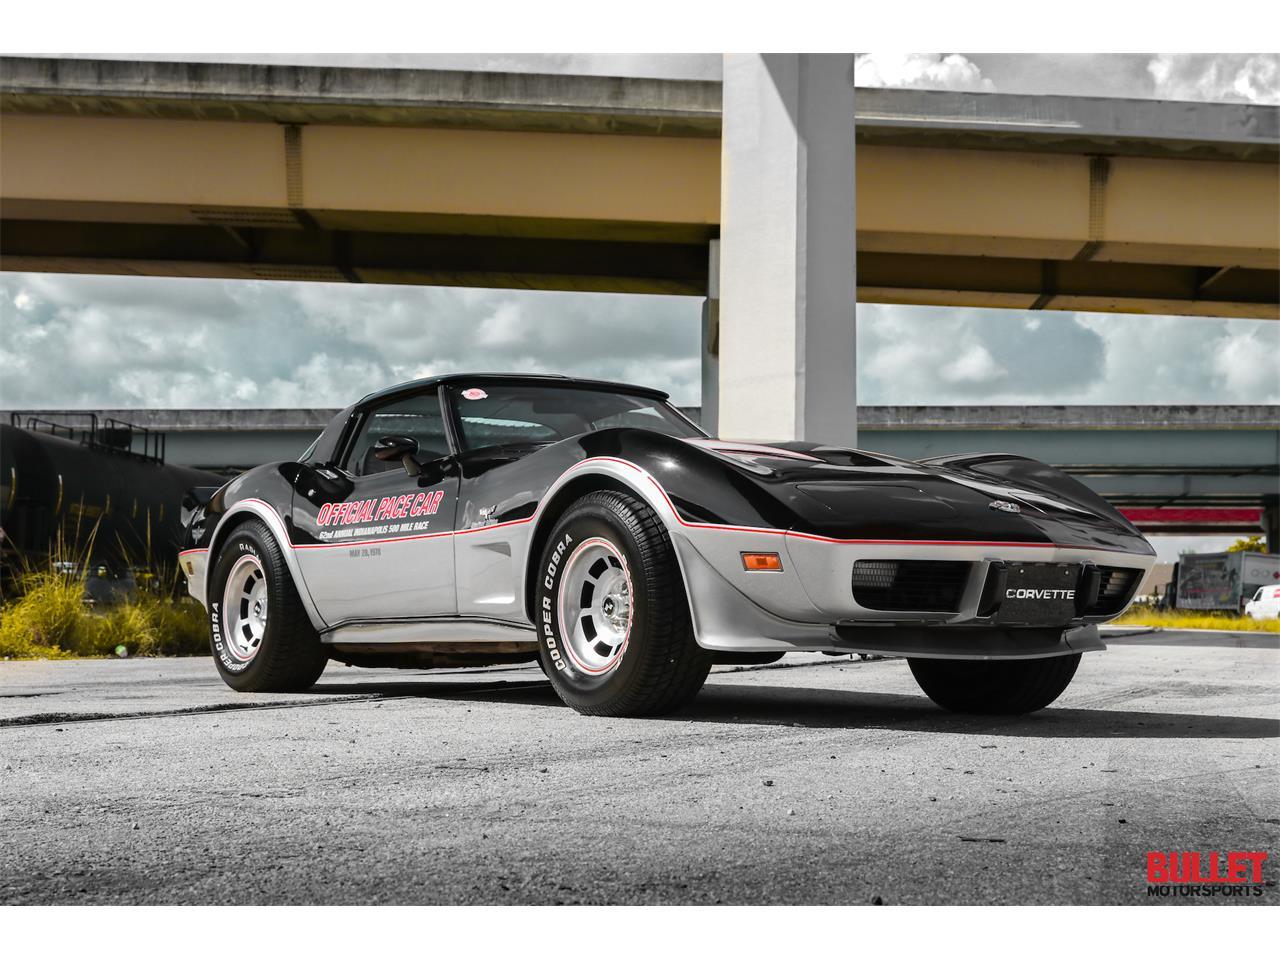 1978 Chevrolet Corvette (CC-1247089) for sale in Fort Lauderdale, Florida